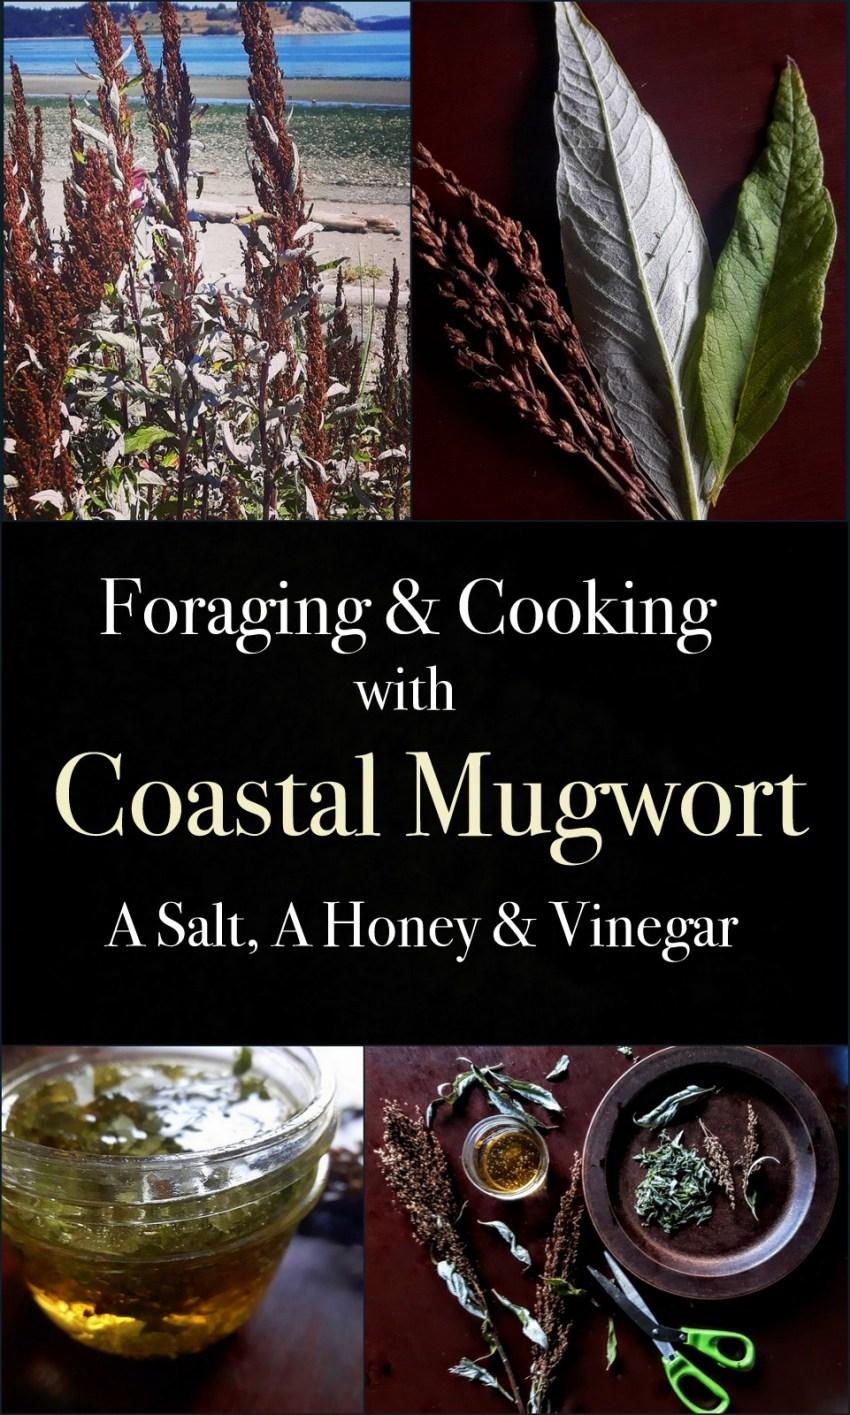 coastalmugwort2-001